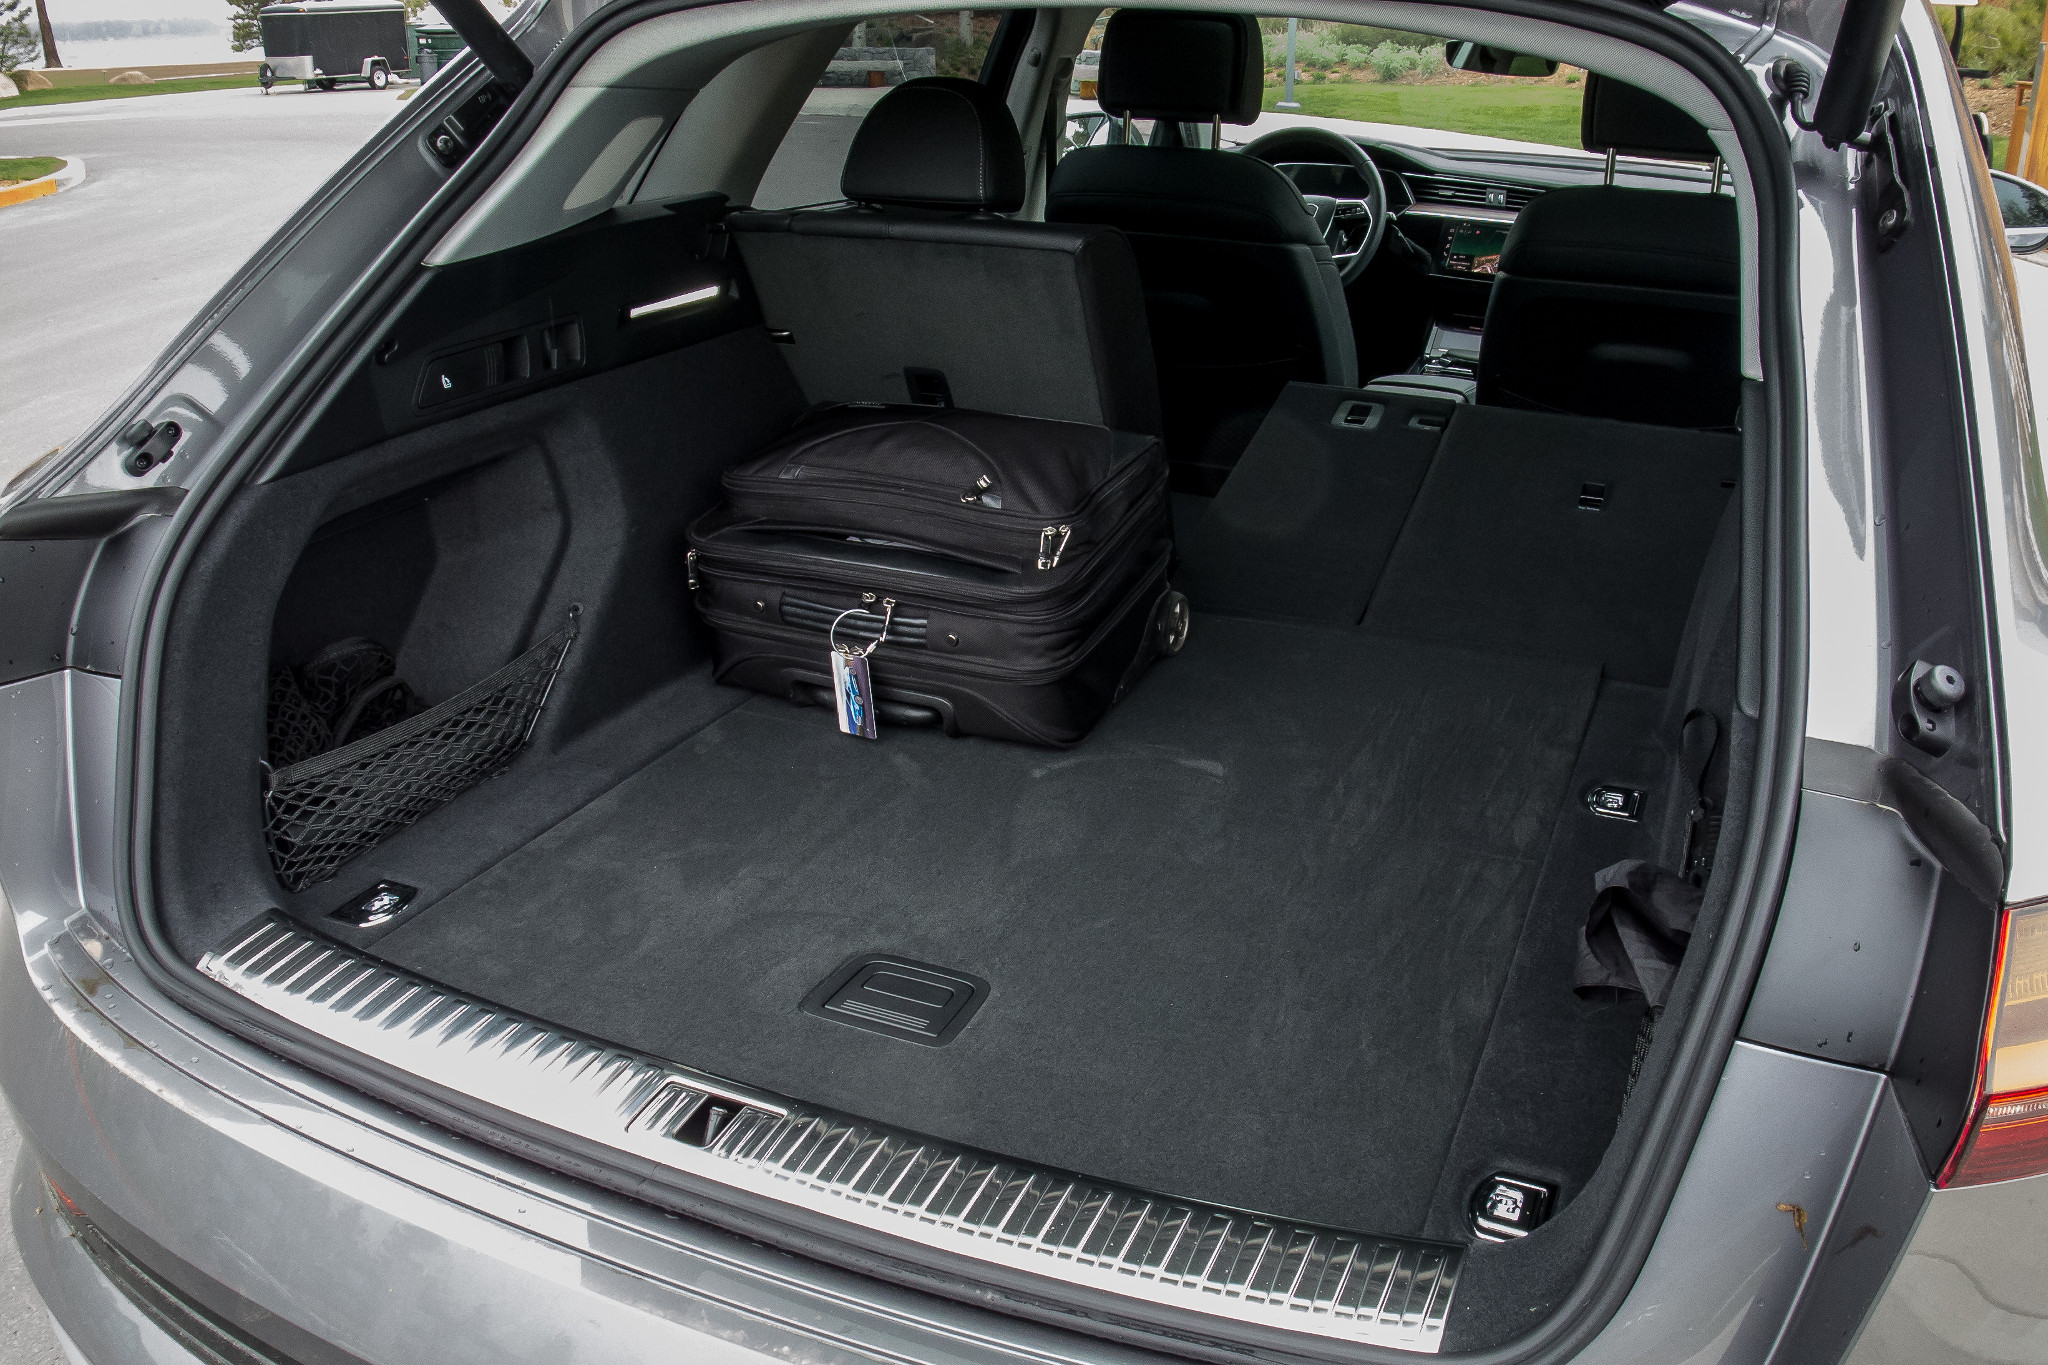 11-audi-e-tron-2019-folding-seats--interior--trunk.jpg